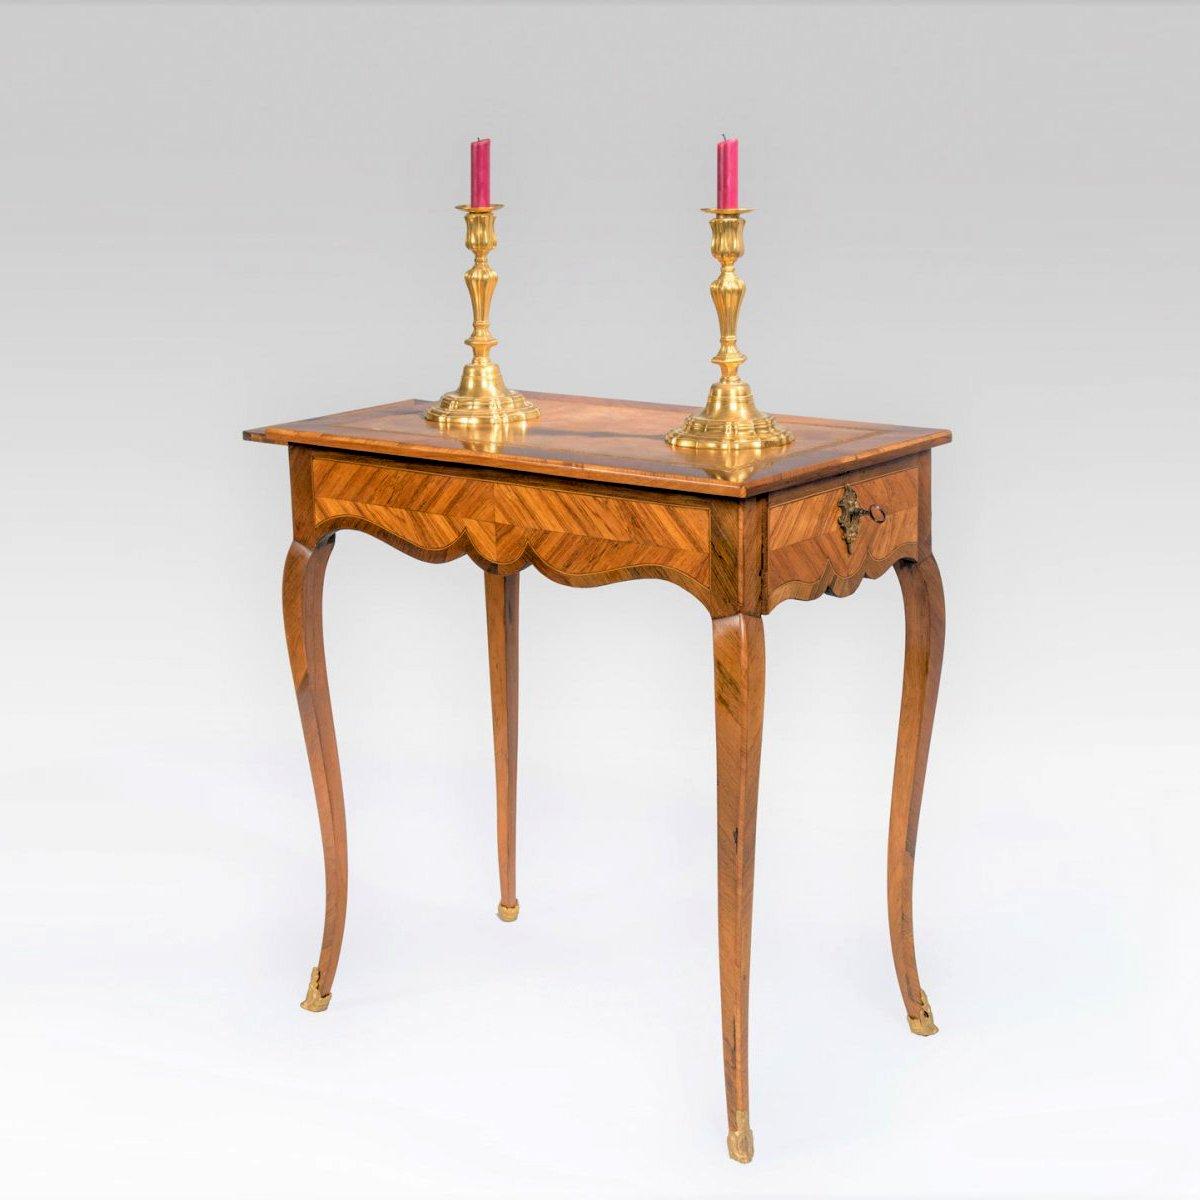 Table en bois dépoque Louis XV  XVIIIe siècle  N61987